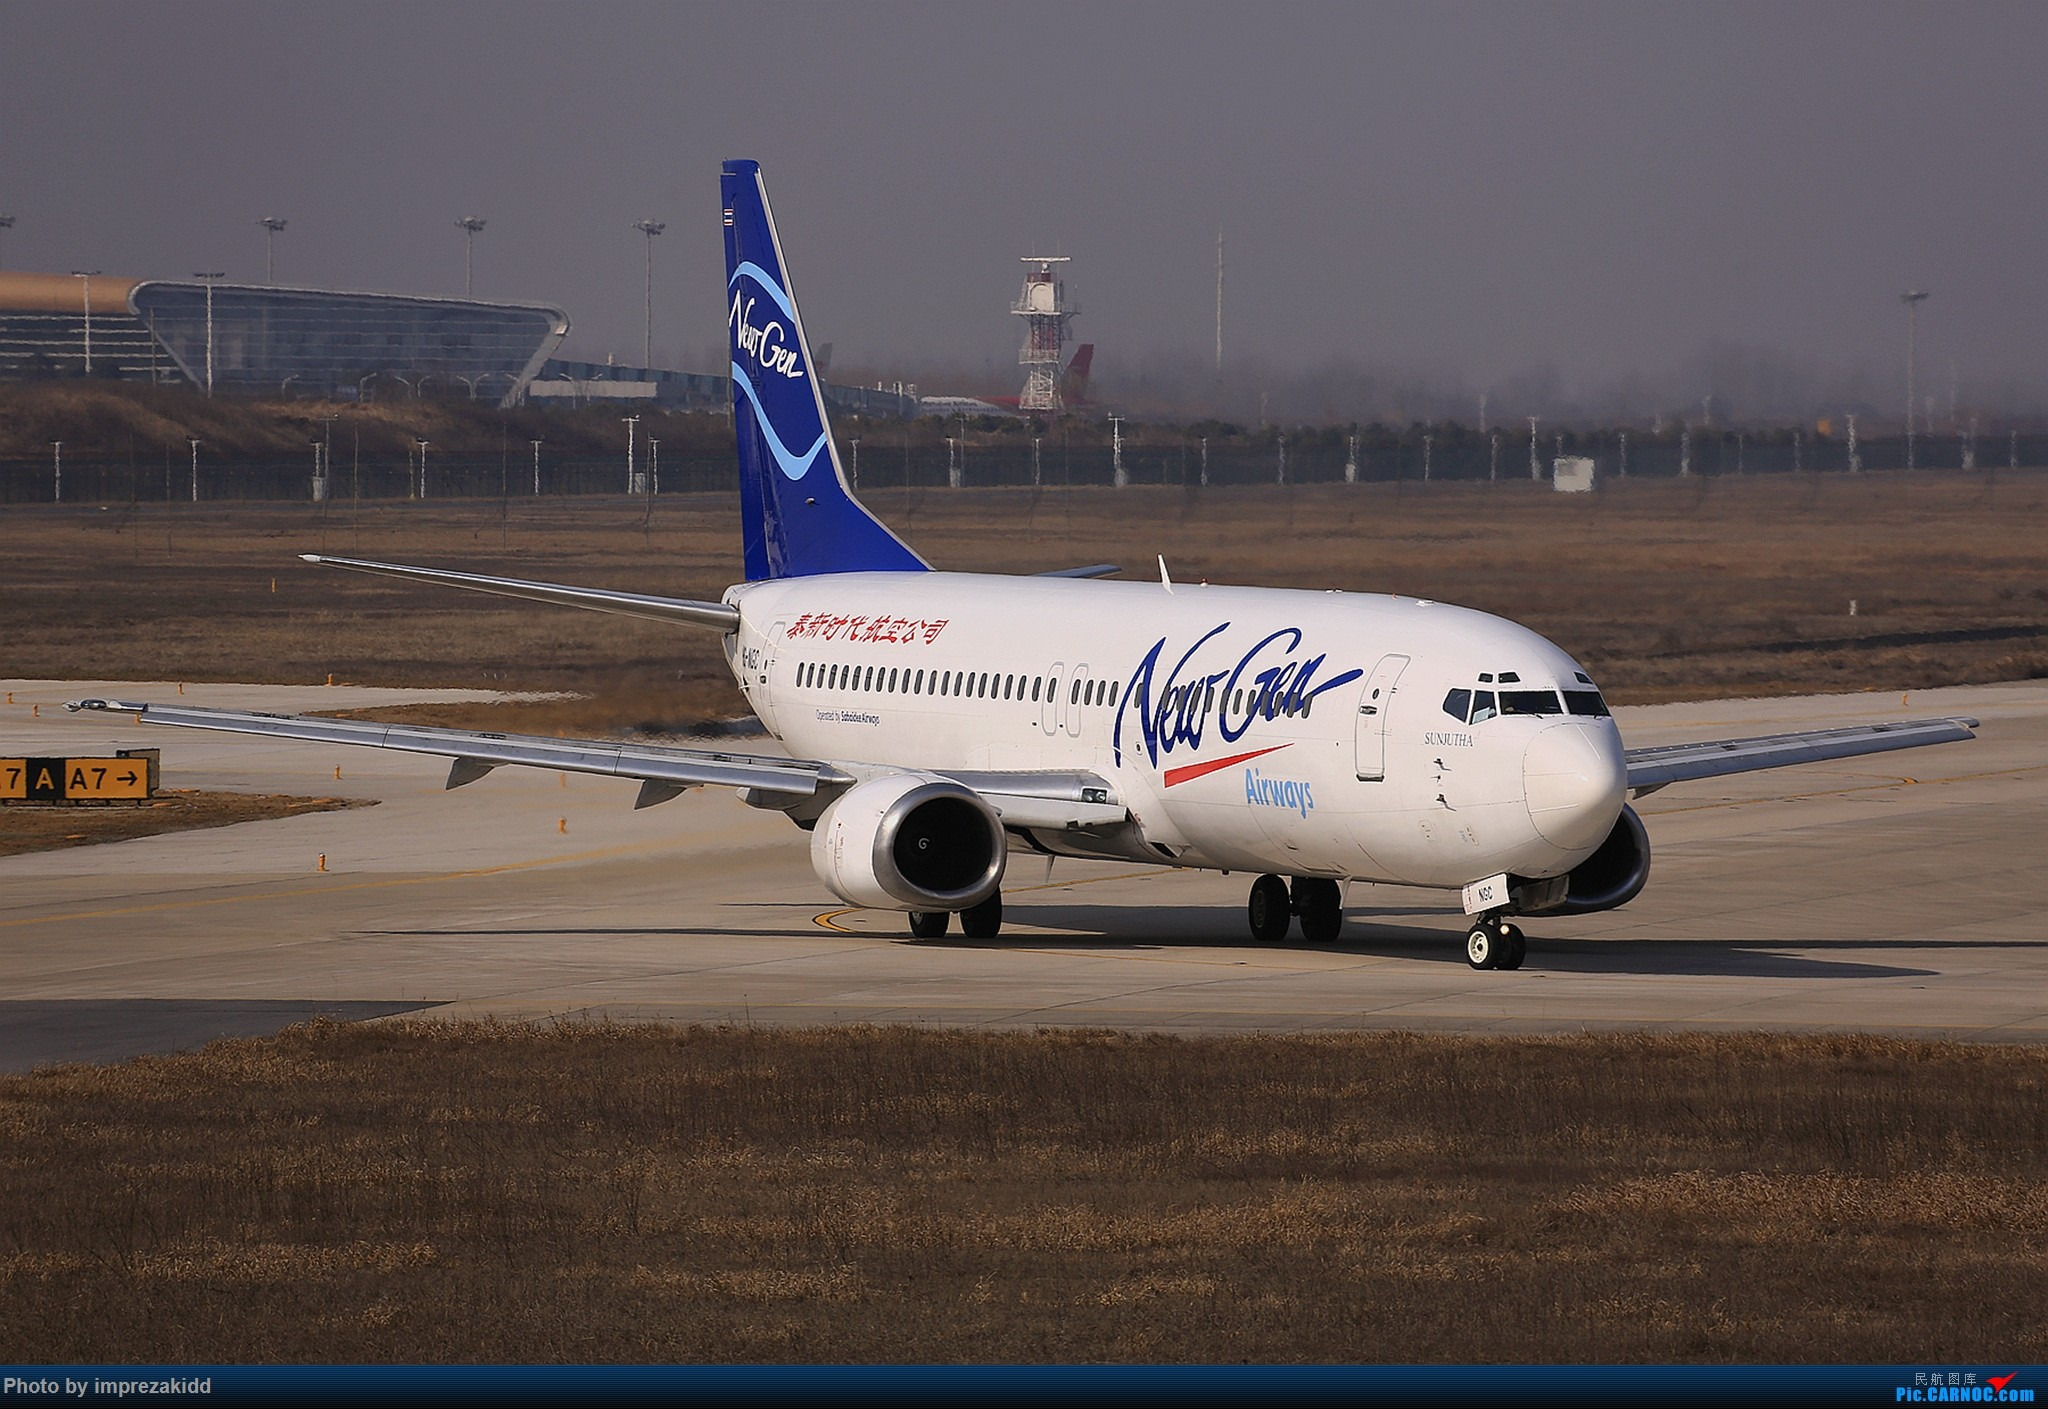 Re:[原创]【合肥飞友会·霸都打机队】又是一年拍机时《上半场》 BOEING 737-400 HS-NGC 中国合肥新桥国际机场